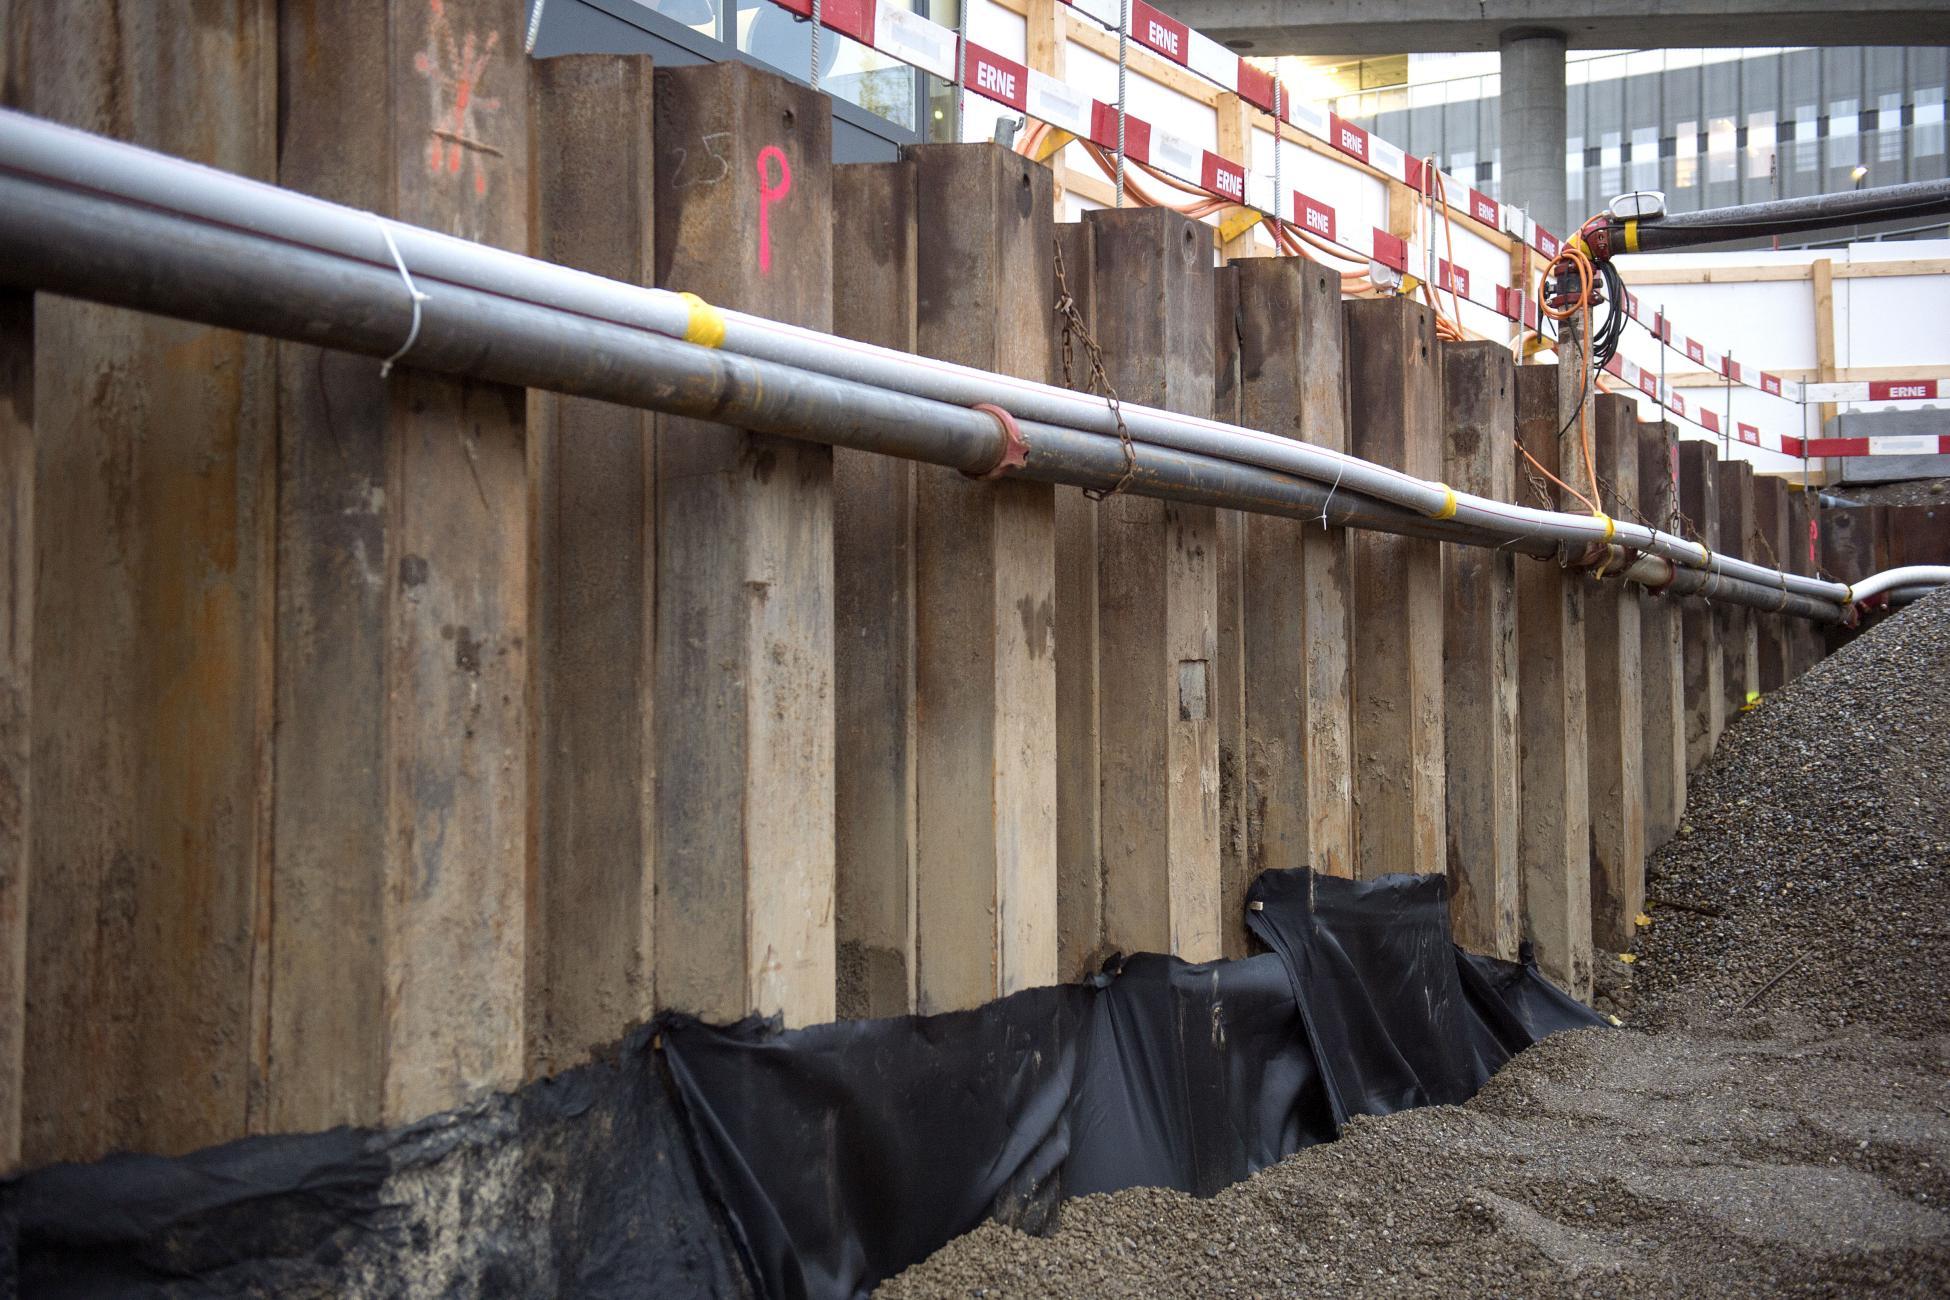 Tiefbau Baugrube KAPO Zürich Rühlwand